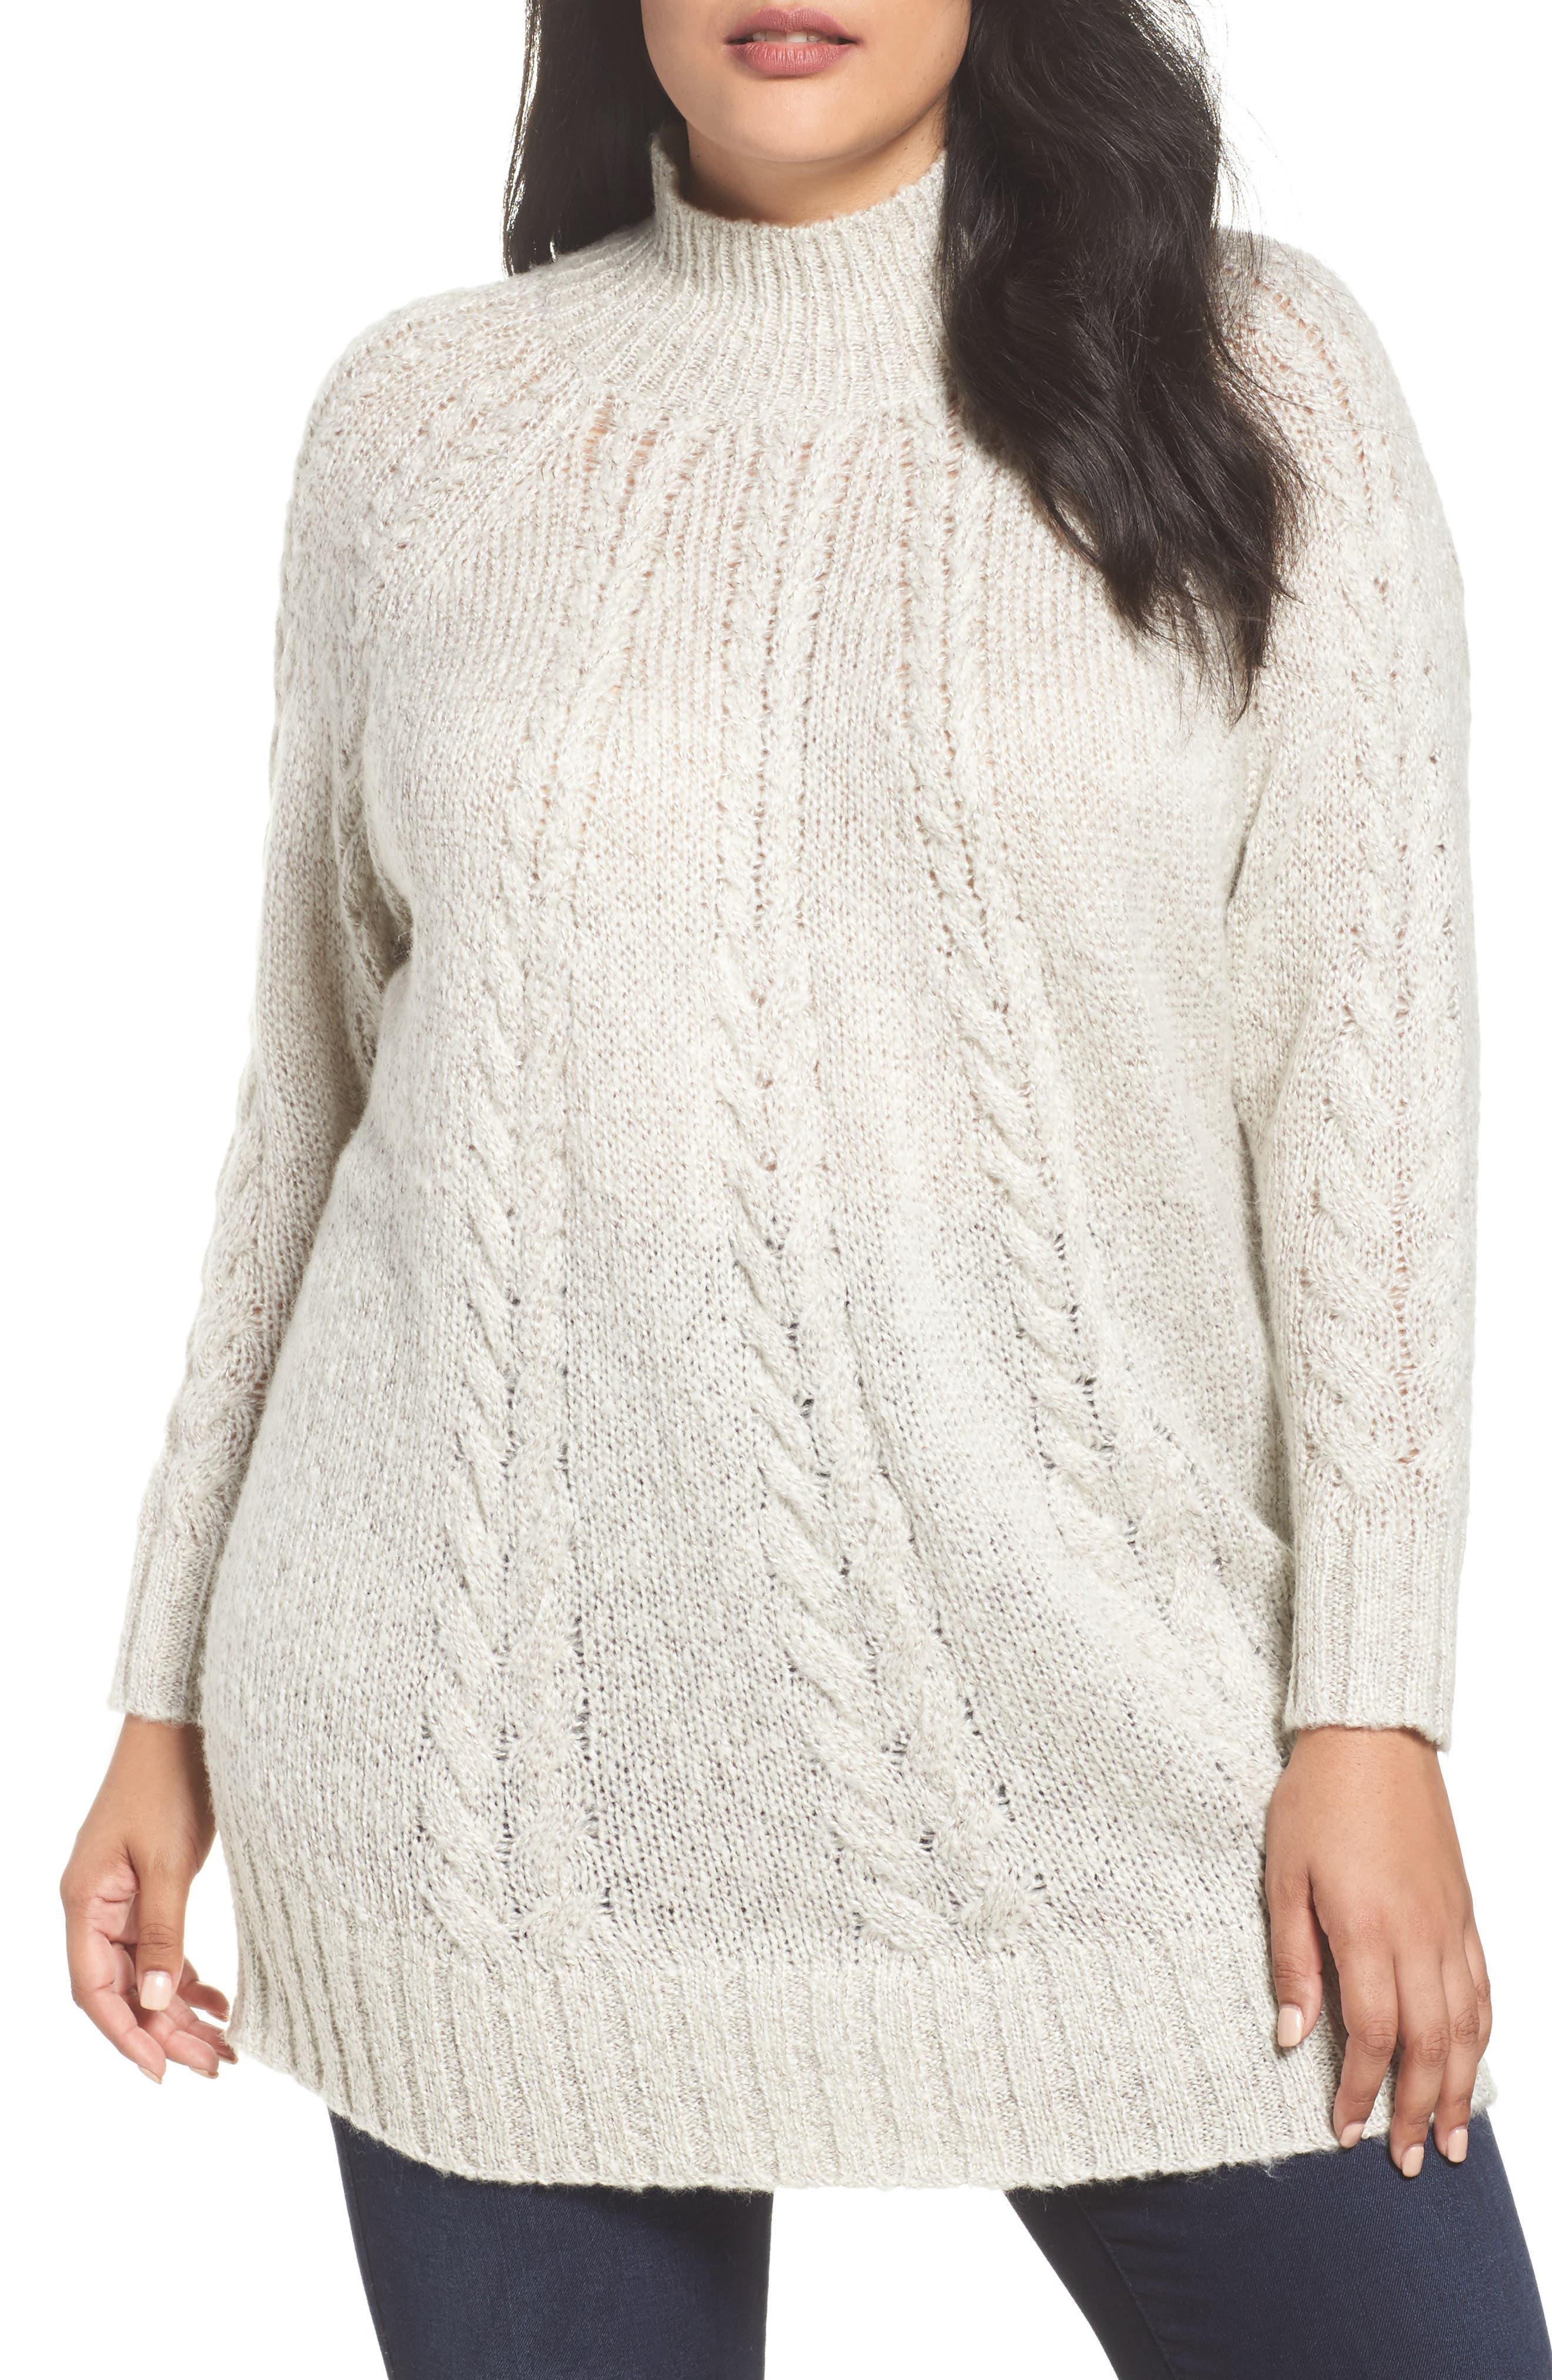 Main Image - Caslon® Cable Knit Tunic Sweater (Plus Size)